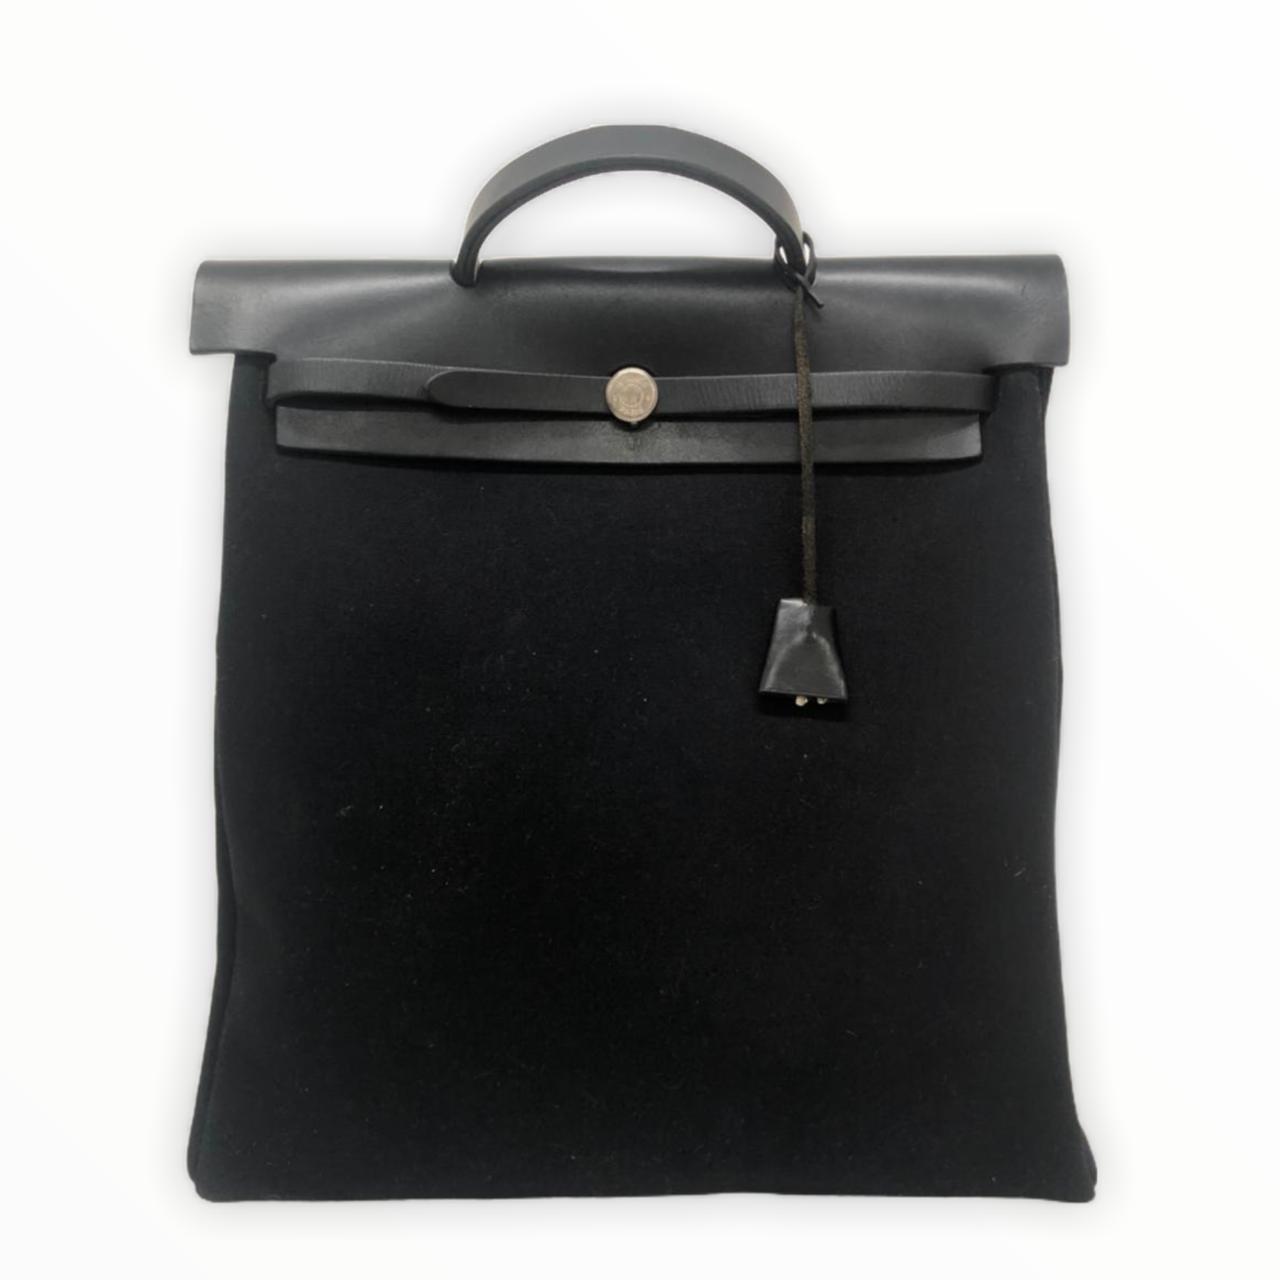 Bolsa Hermès Herbag 39 Preta